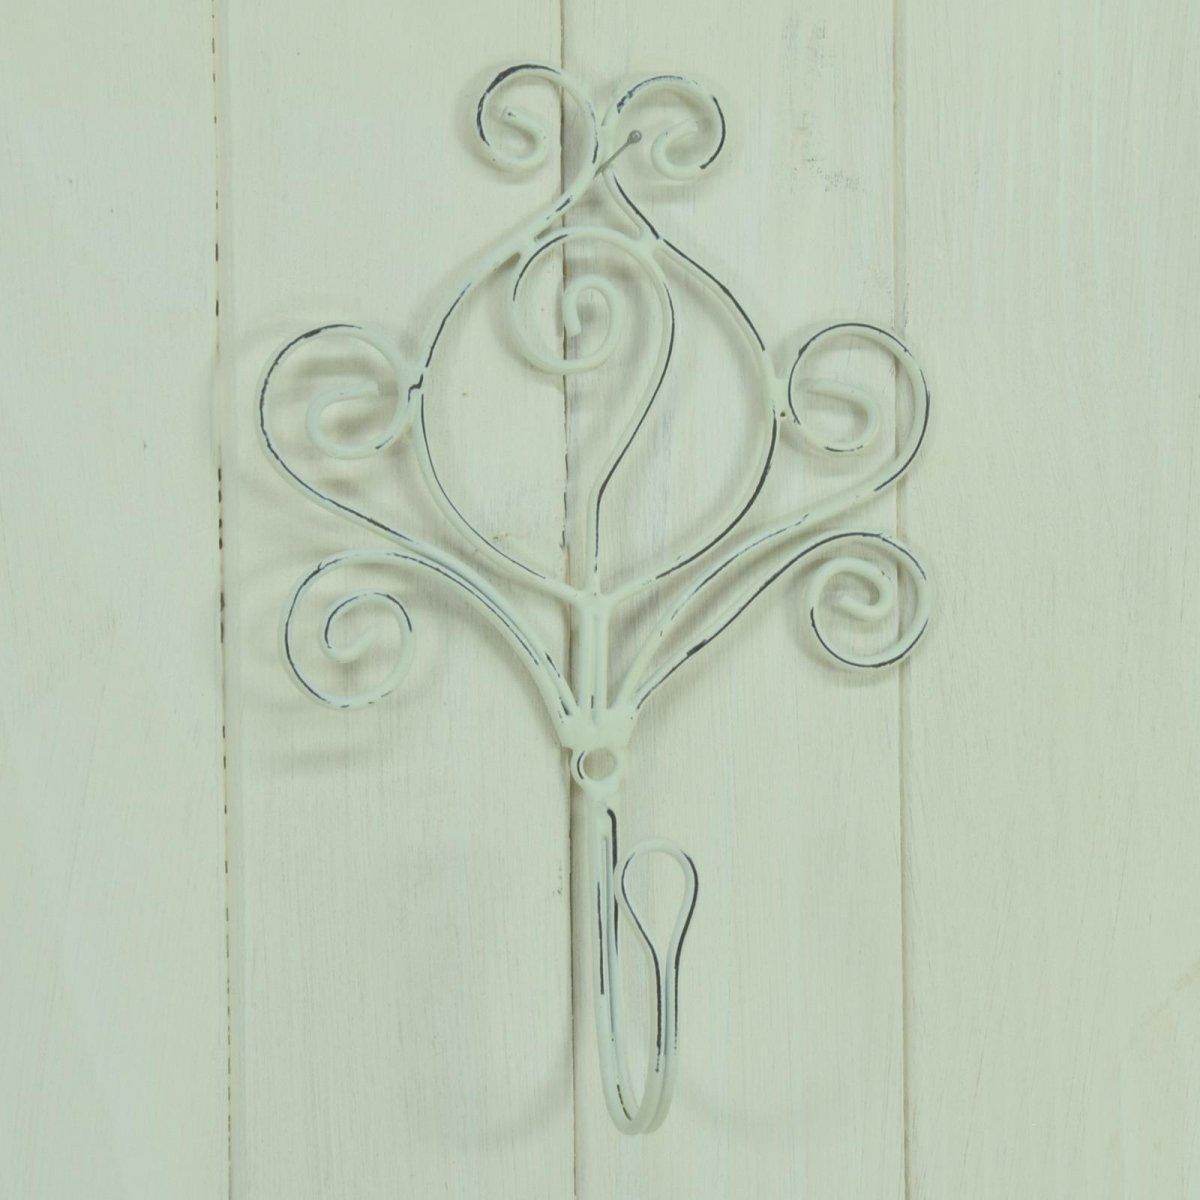 Haken Wandhaken Kleiderhaken Handtuchhaken Garderobenhaken Blume Metall Shabby